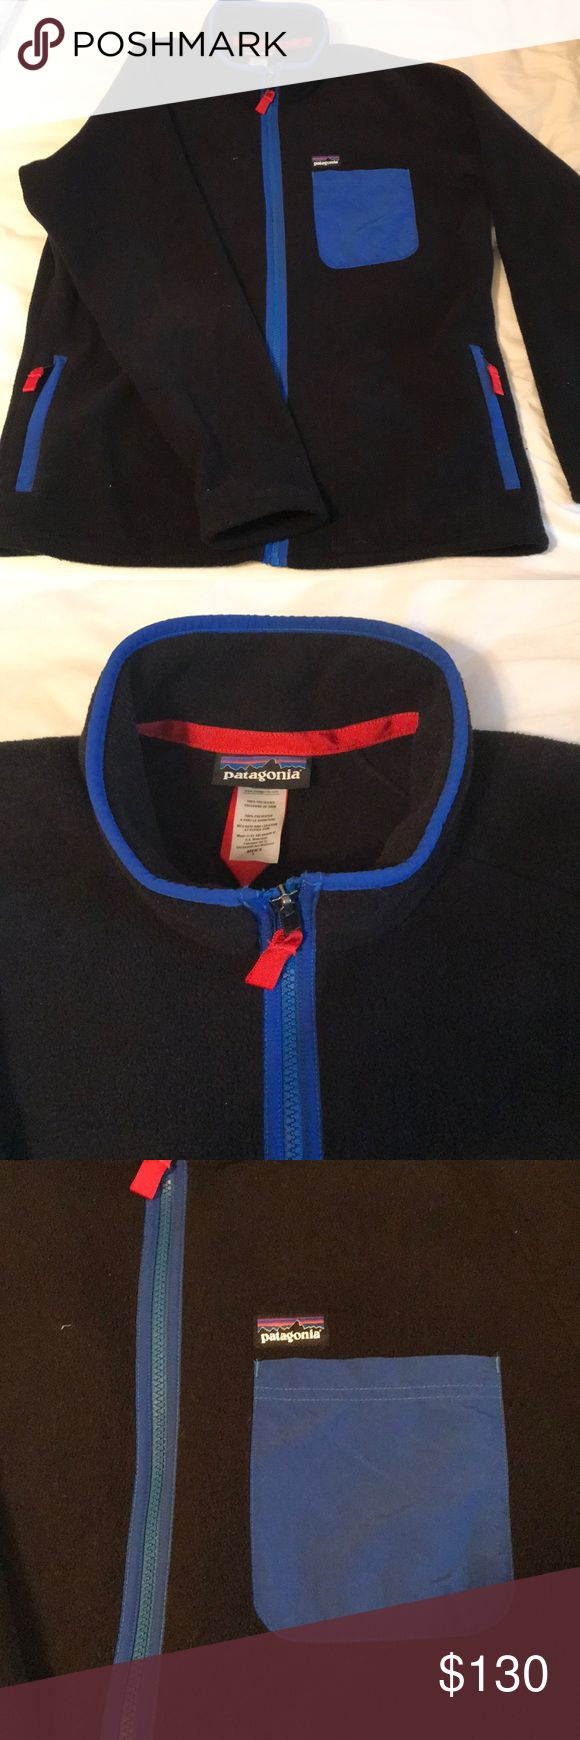 Patagonia, fleece jacket. Soft, Black Patagonia fleece zip up jacket with front breast pocket. Patagonia Sweaters Zip Up